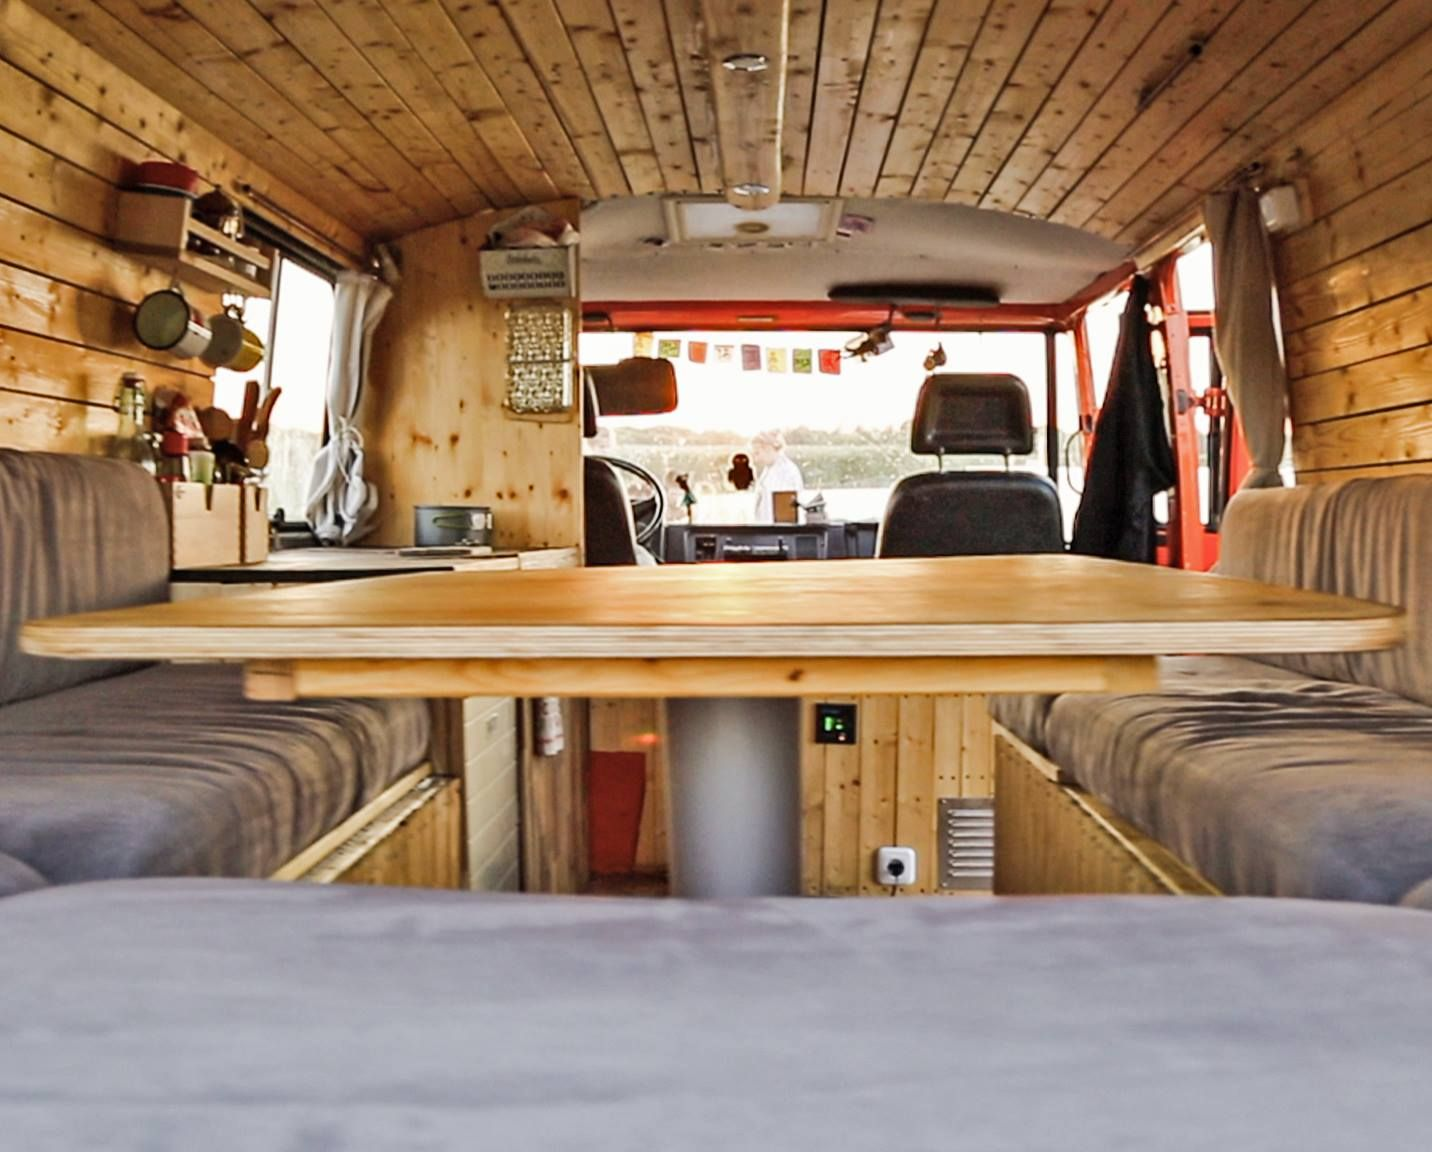 Selbstausbau Wohnmobil  Wohnmobil ausbauen, Campingbus ausbau